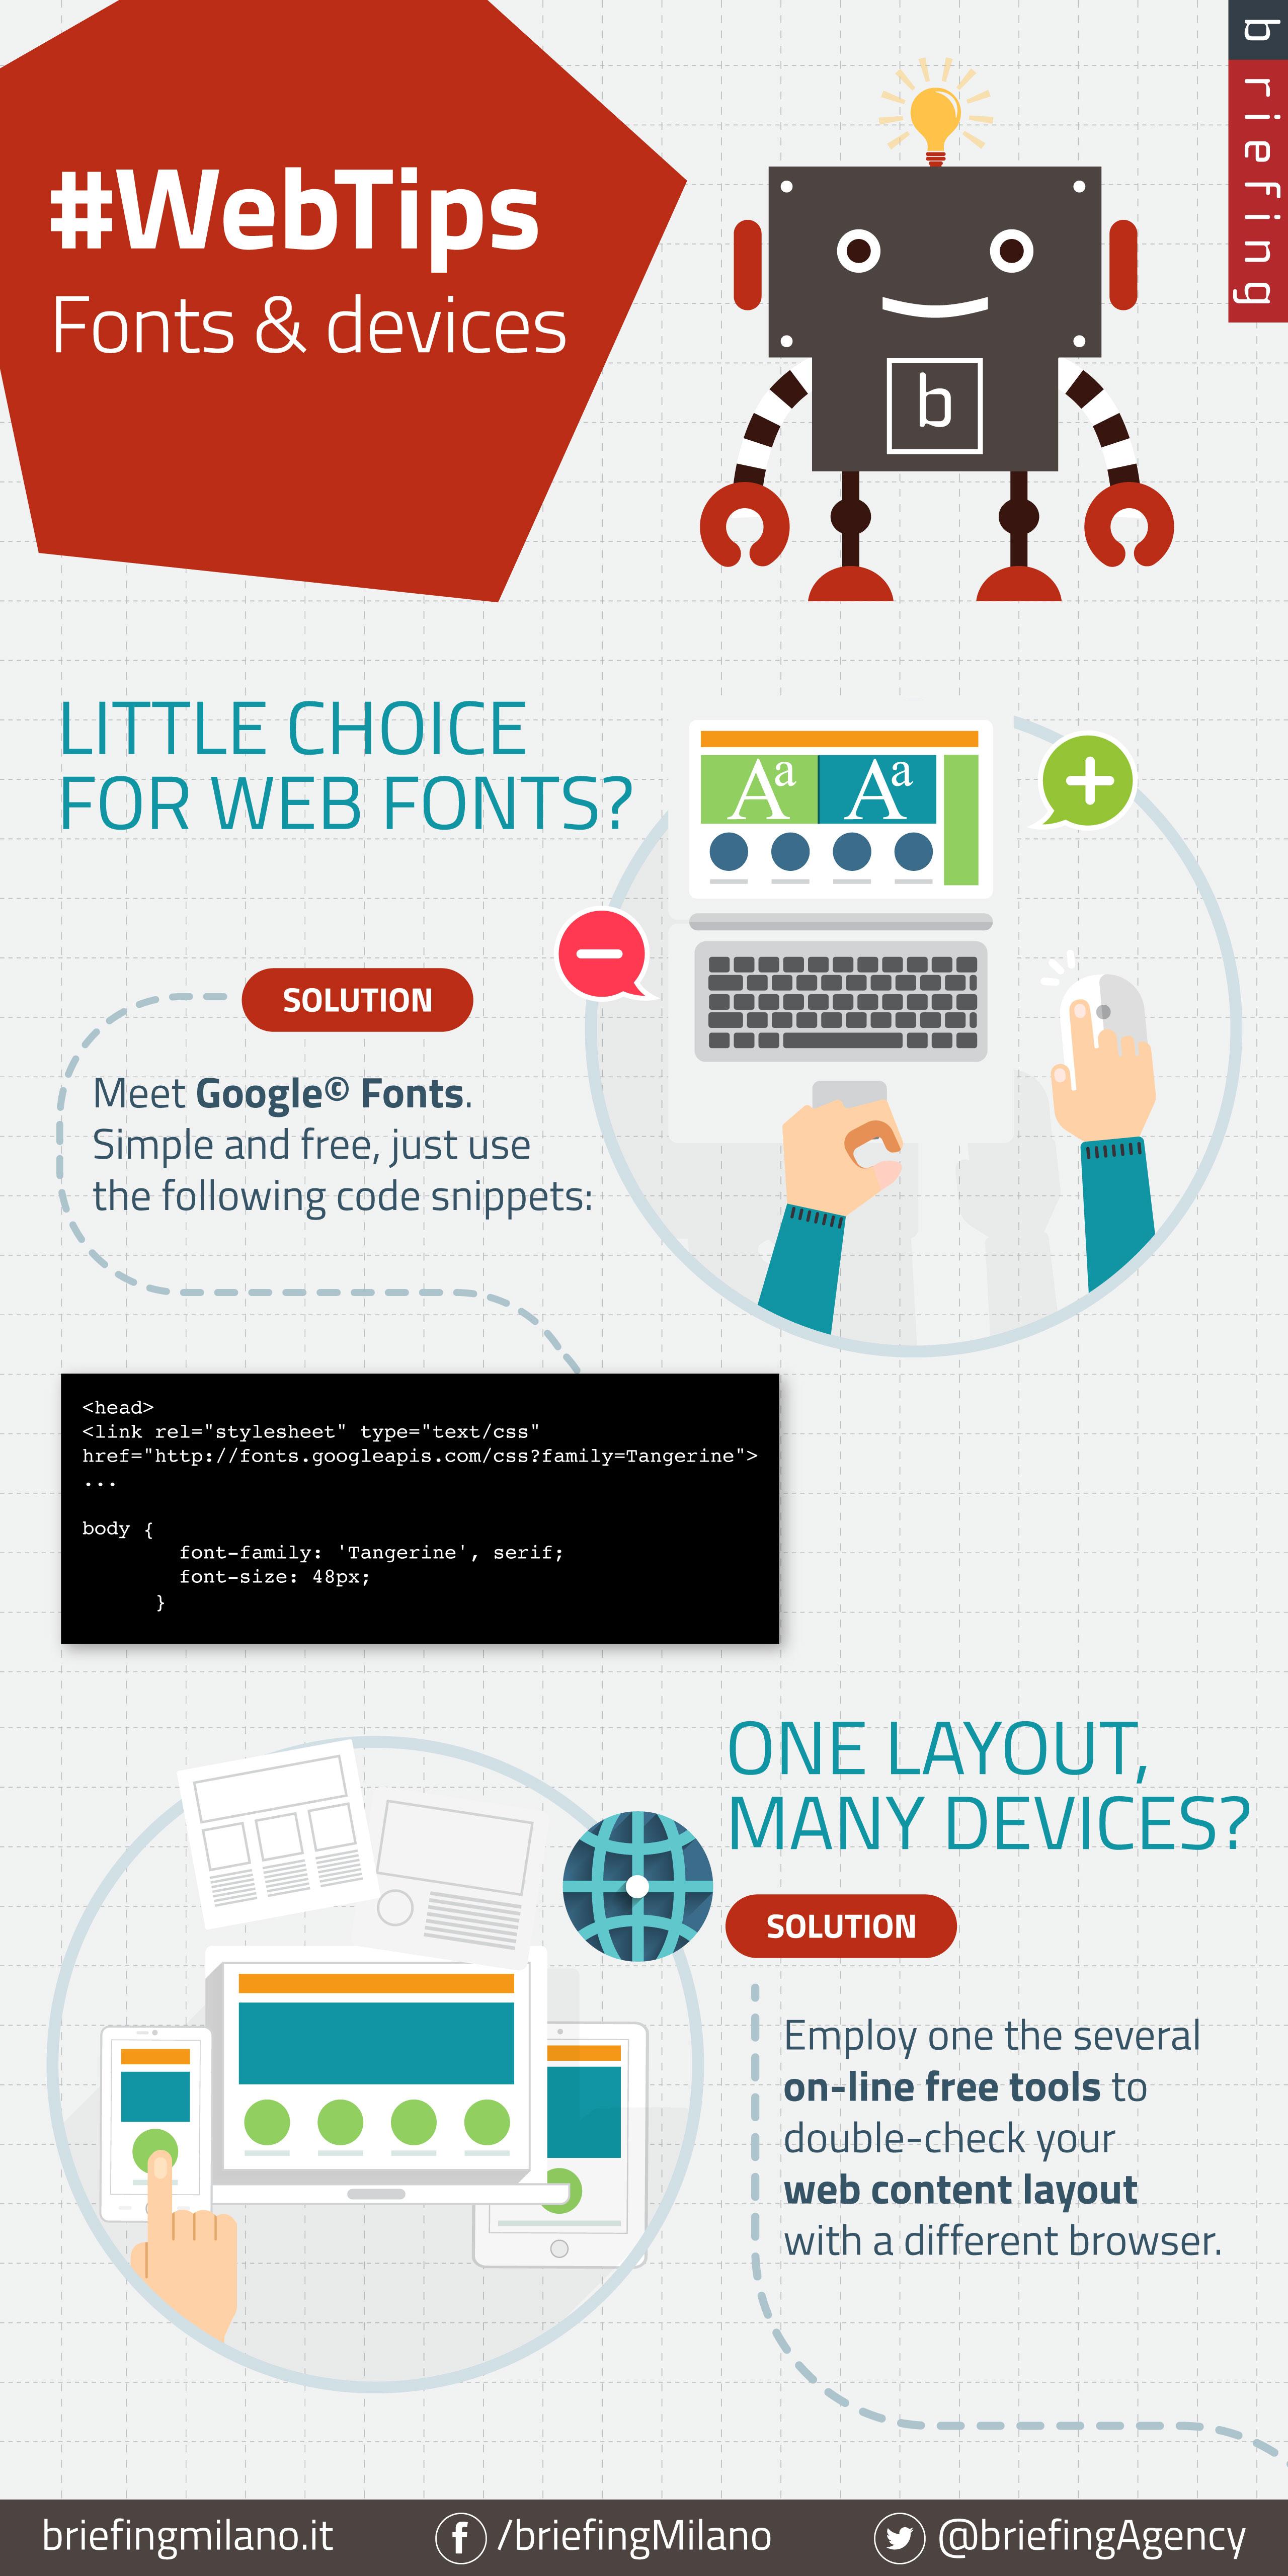 BriefingMilano WebTips - Fonts&Devices